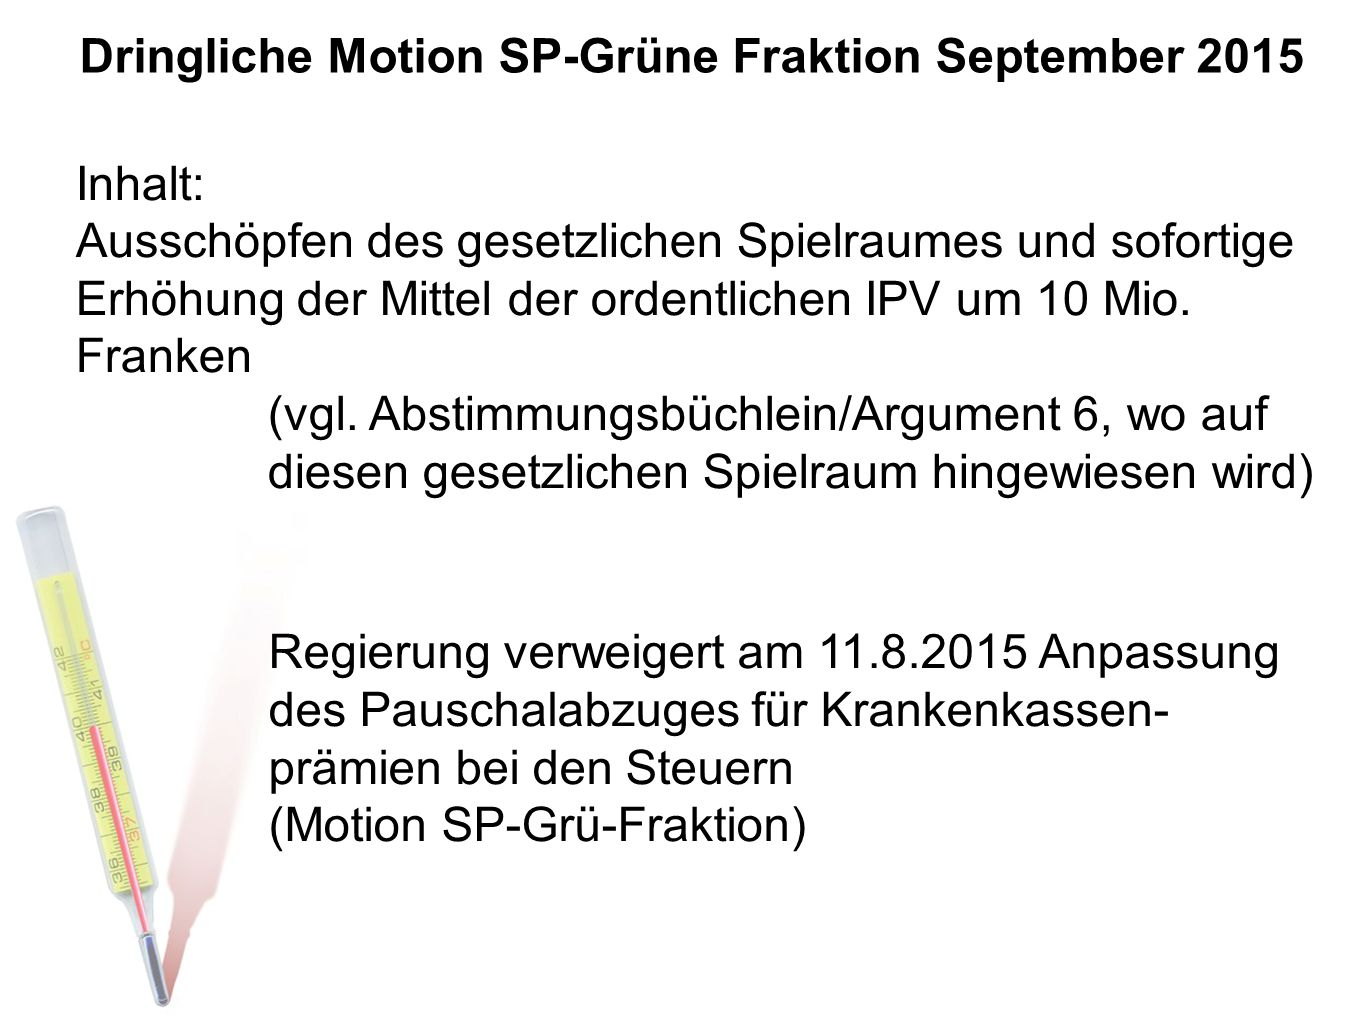 Dringliche Motion SP-Grüne Fraktion September 2015